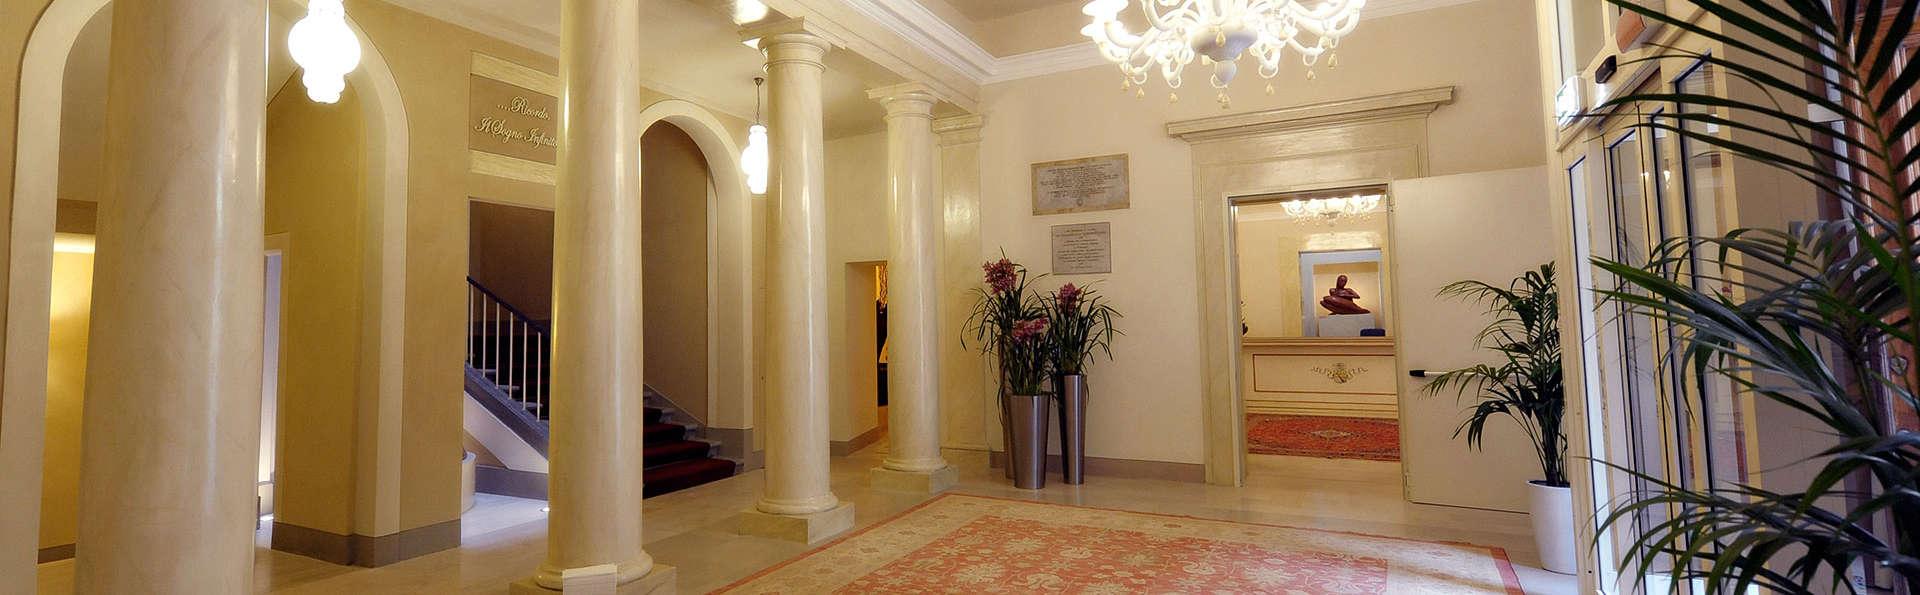 Palazzo San Lorenzo  - edit_Hall1.jpg